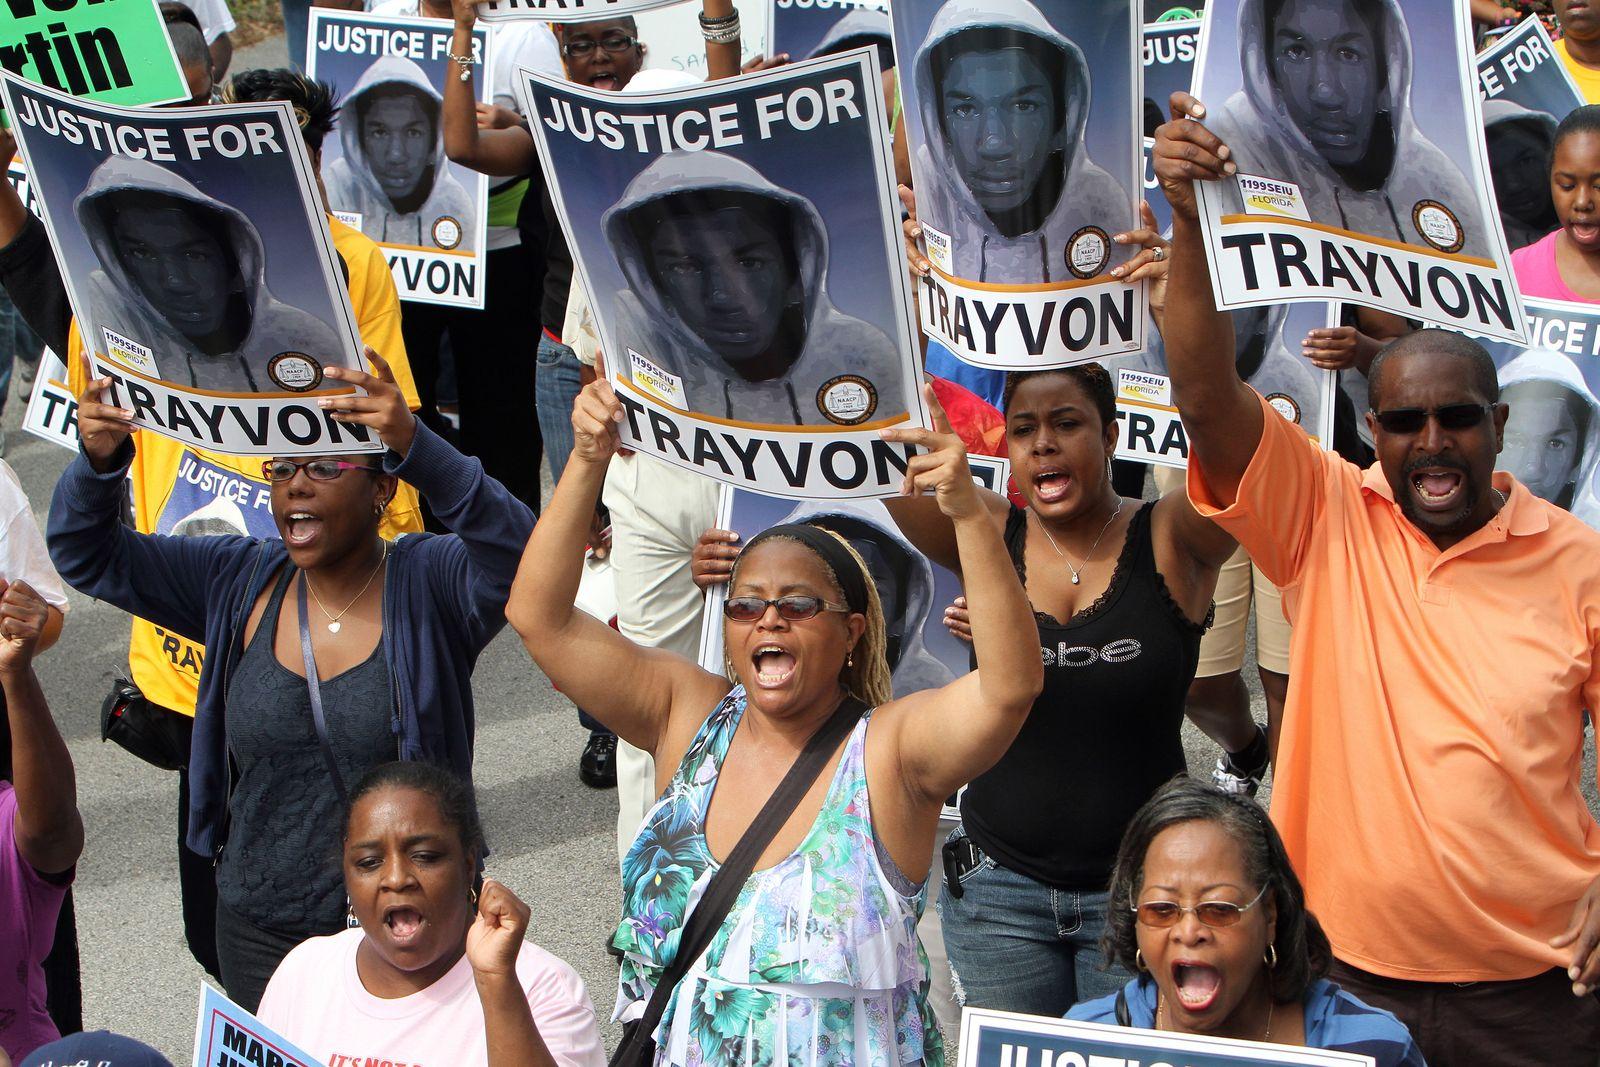 Trayvon Martin rally in Sanford, Florida